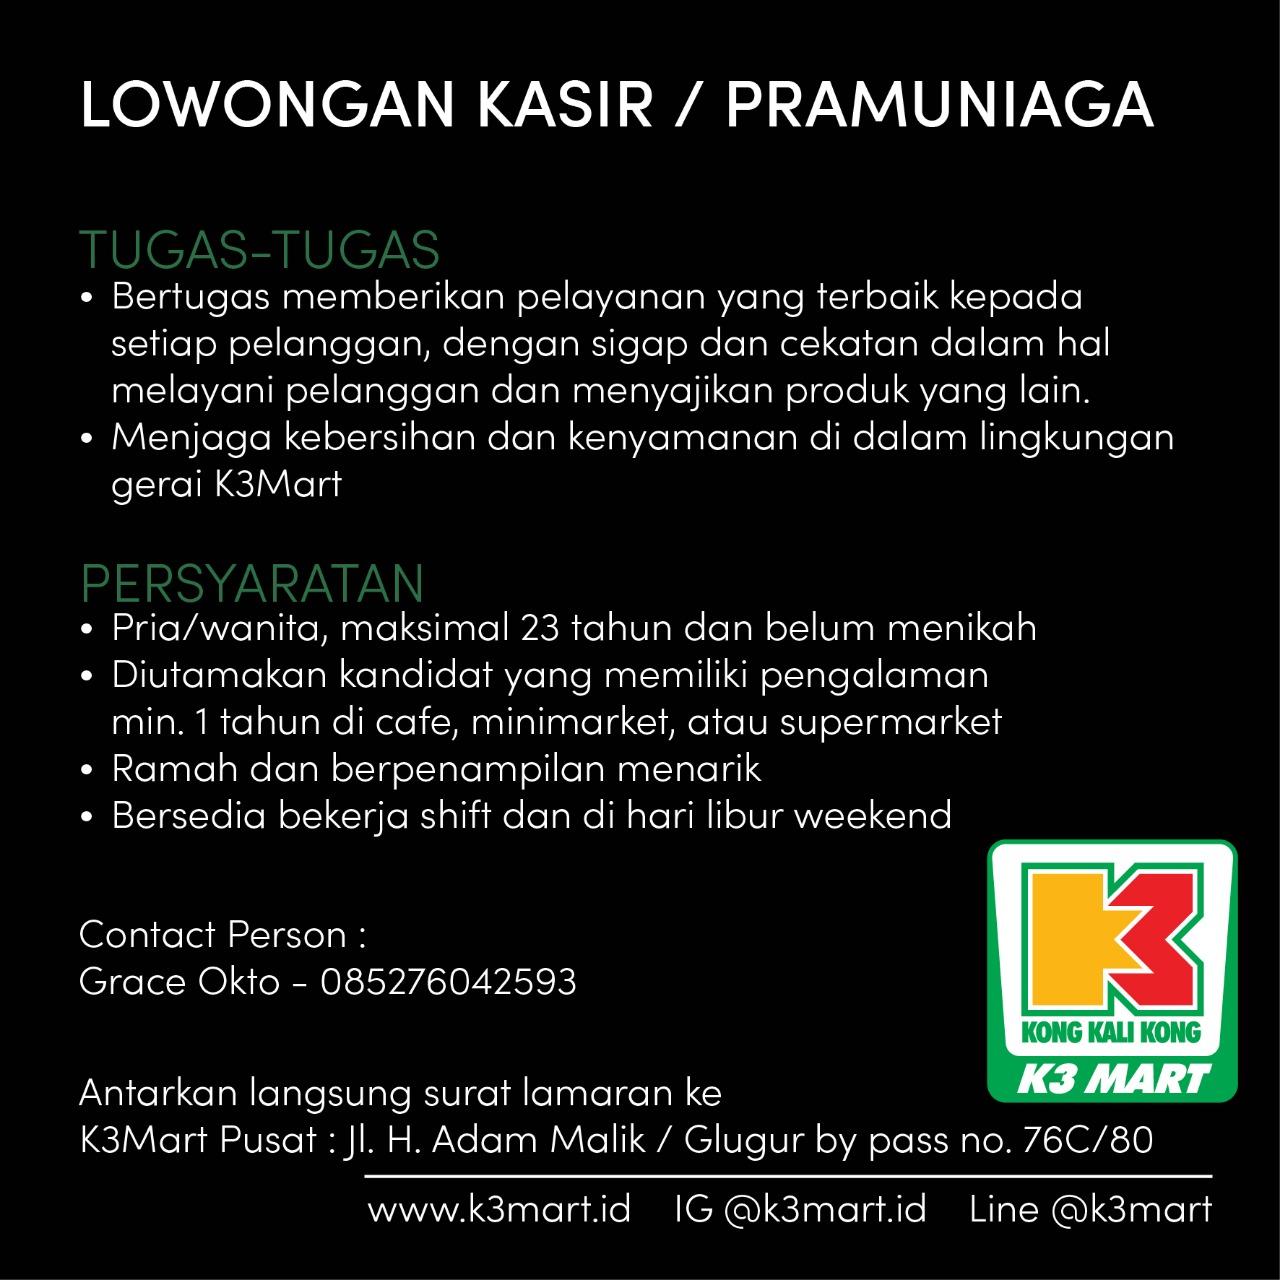 Info Loker Lulusan Sma Smk Di K3 Mart Medan April 2019 Lowongan Kerja Medan Terbaru Tahun 2021